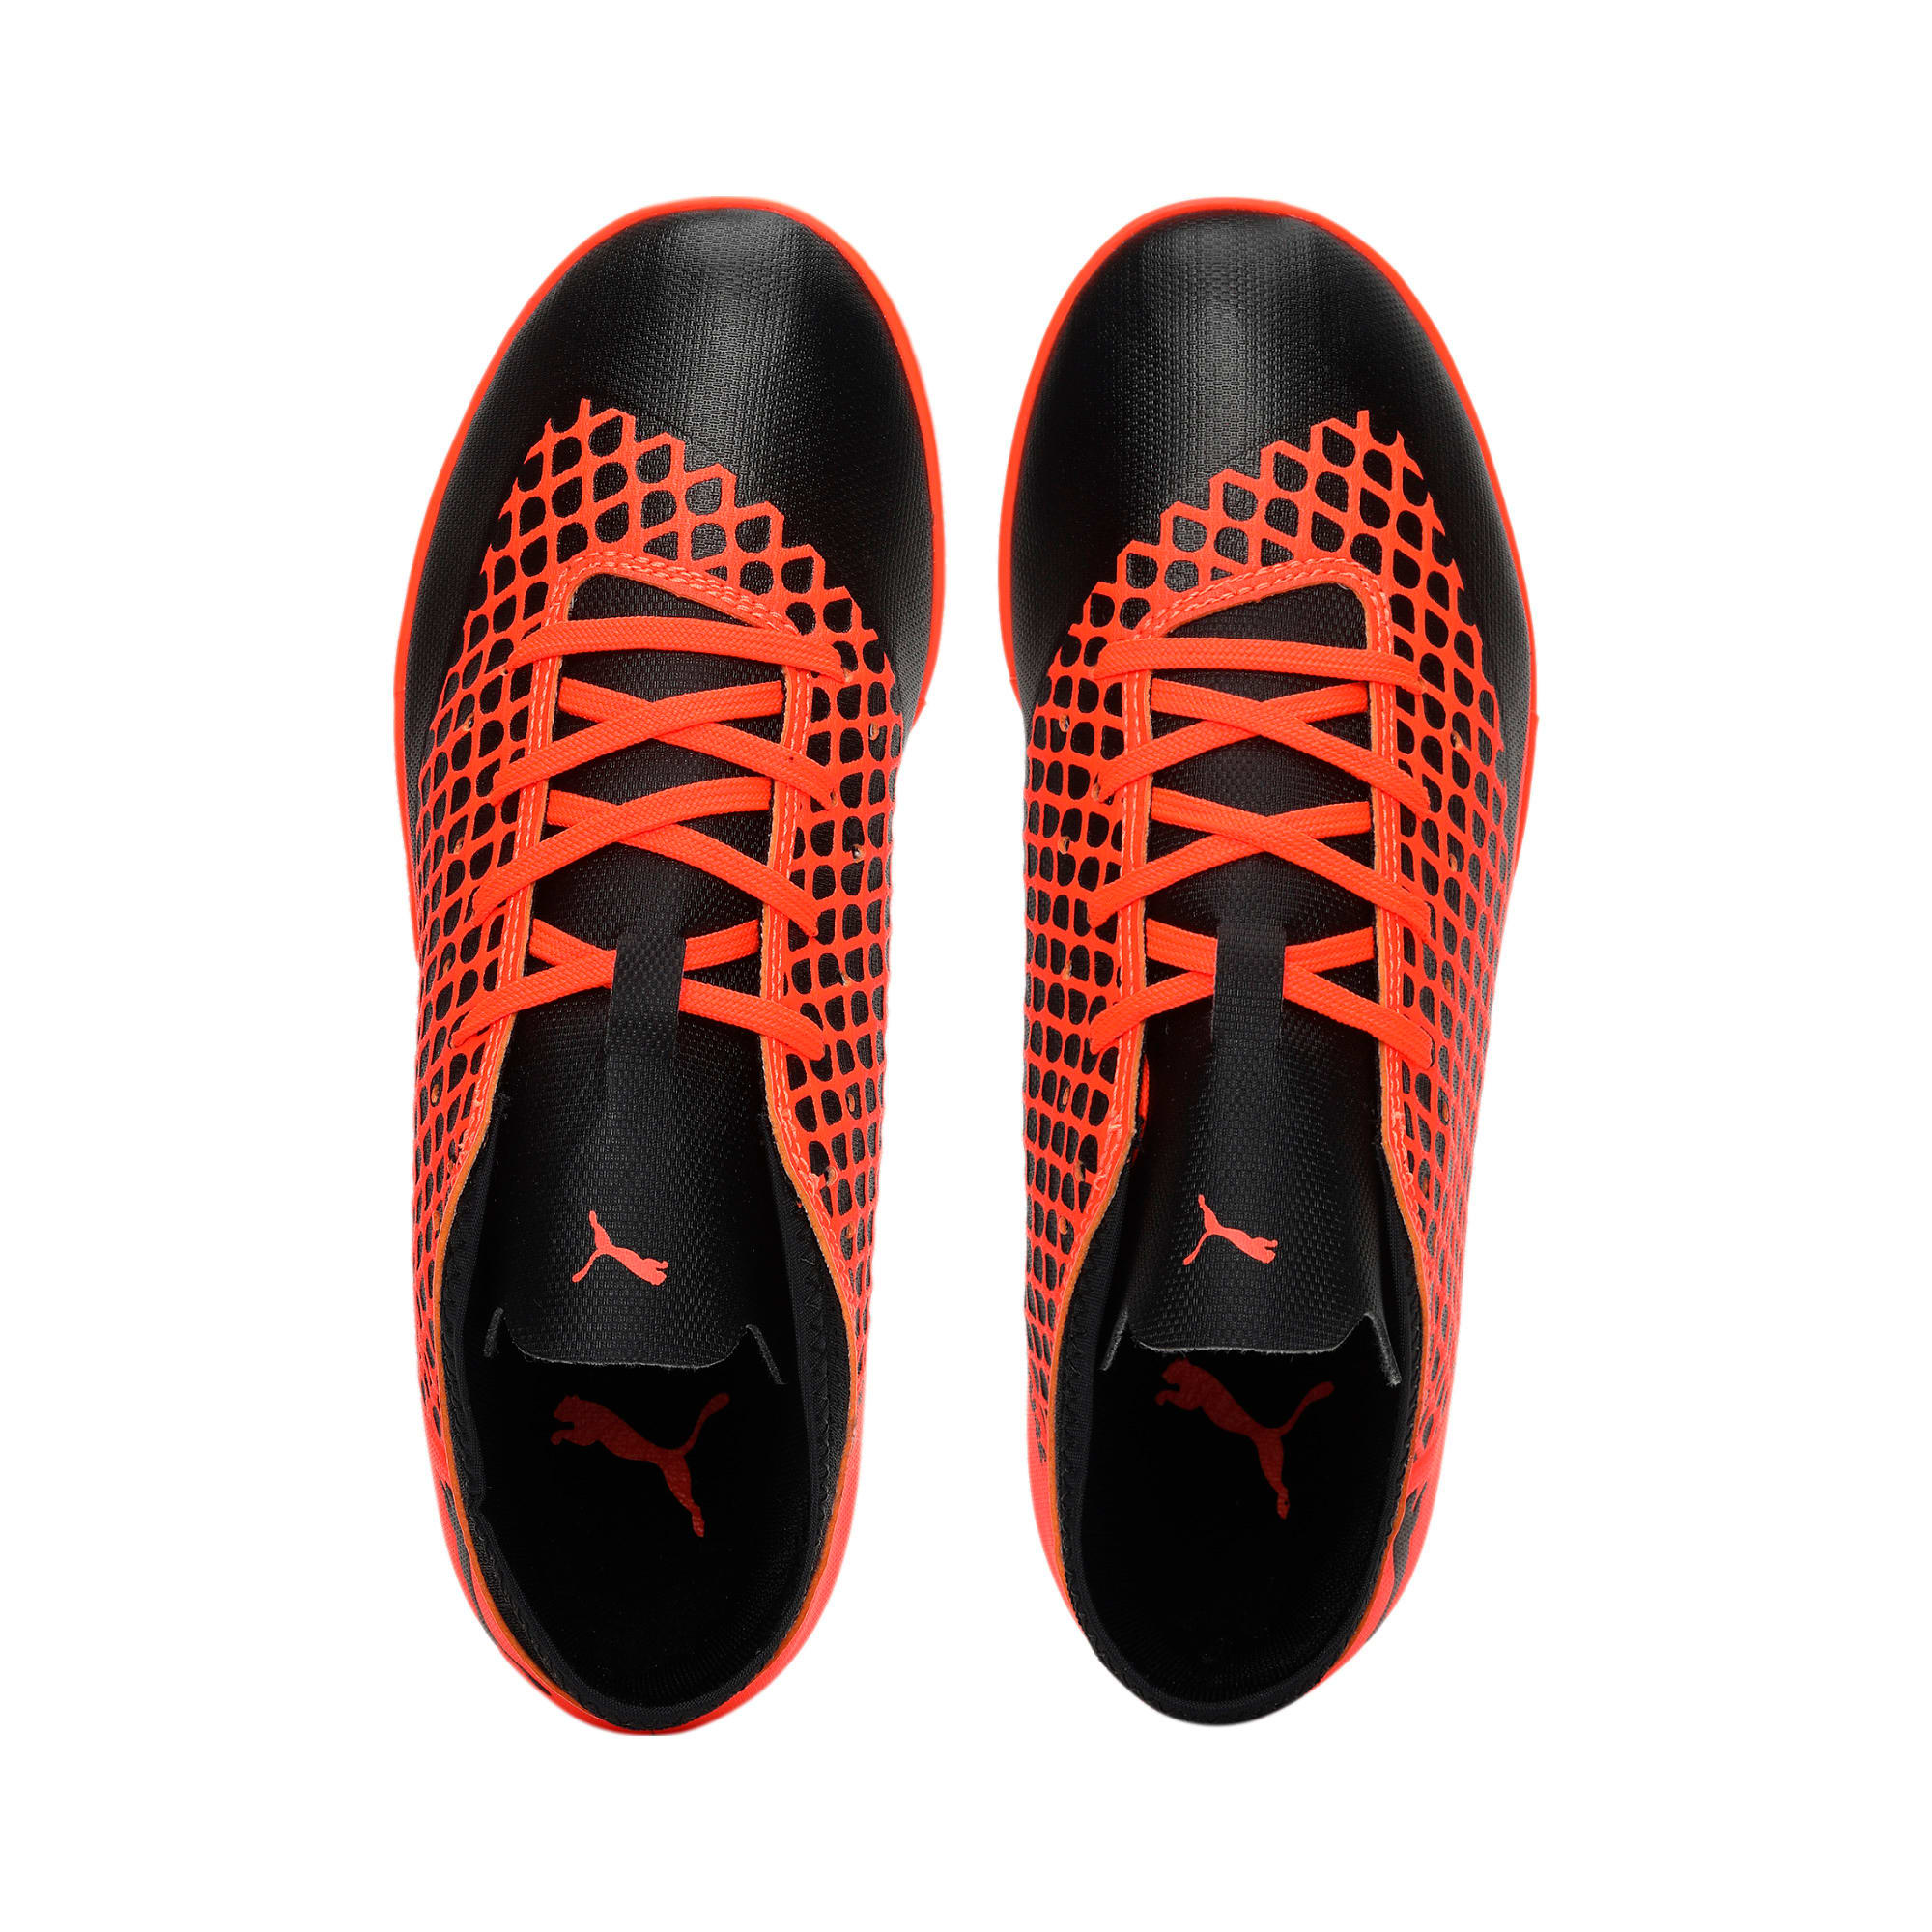 Thumbnail 6 of FUTURE 2.4 IT Kids' Football Shoes, Black-Orange, medium-IND